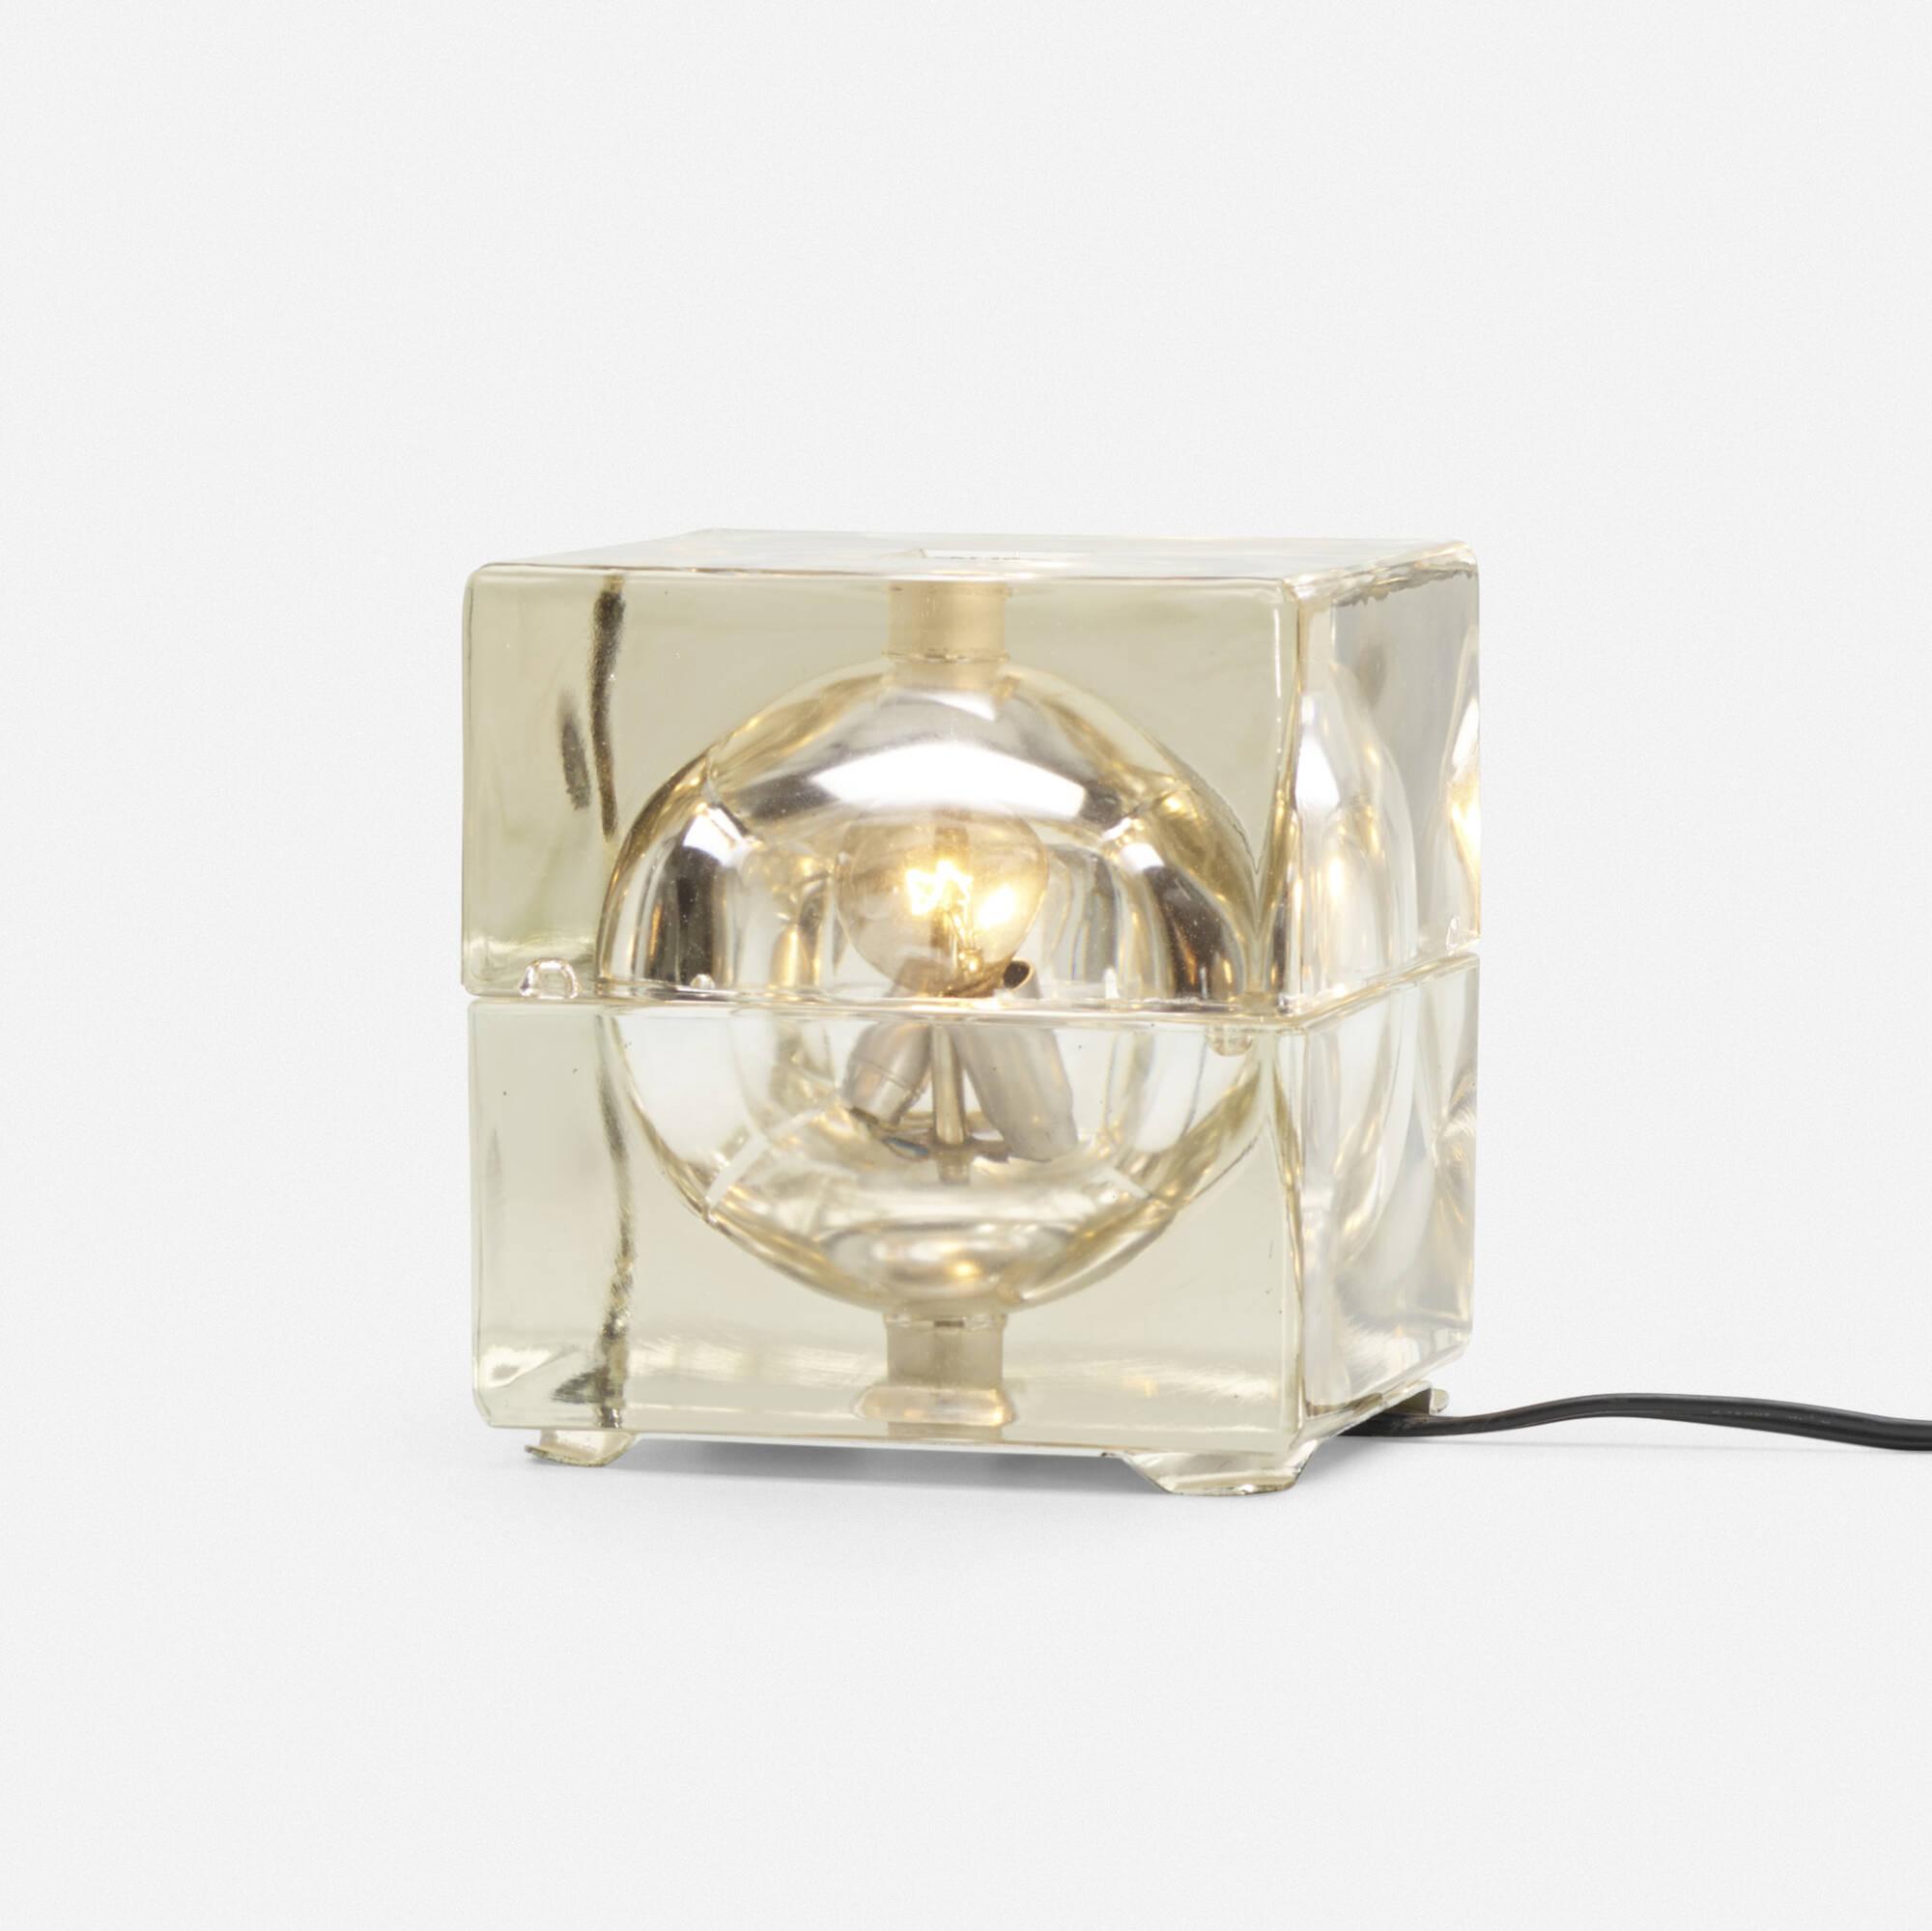 243: Alessandro Mendini / Cubosfera table lamp (1 of 2)